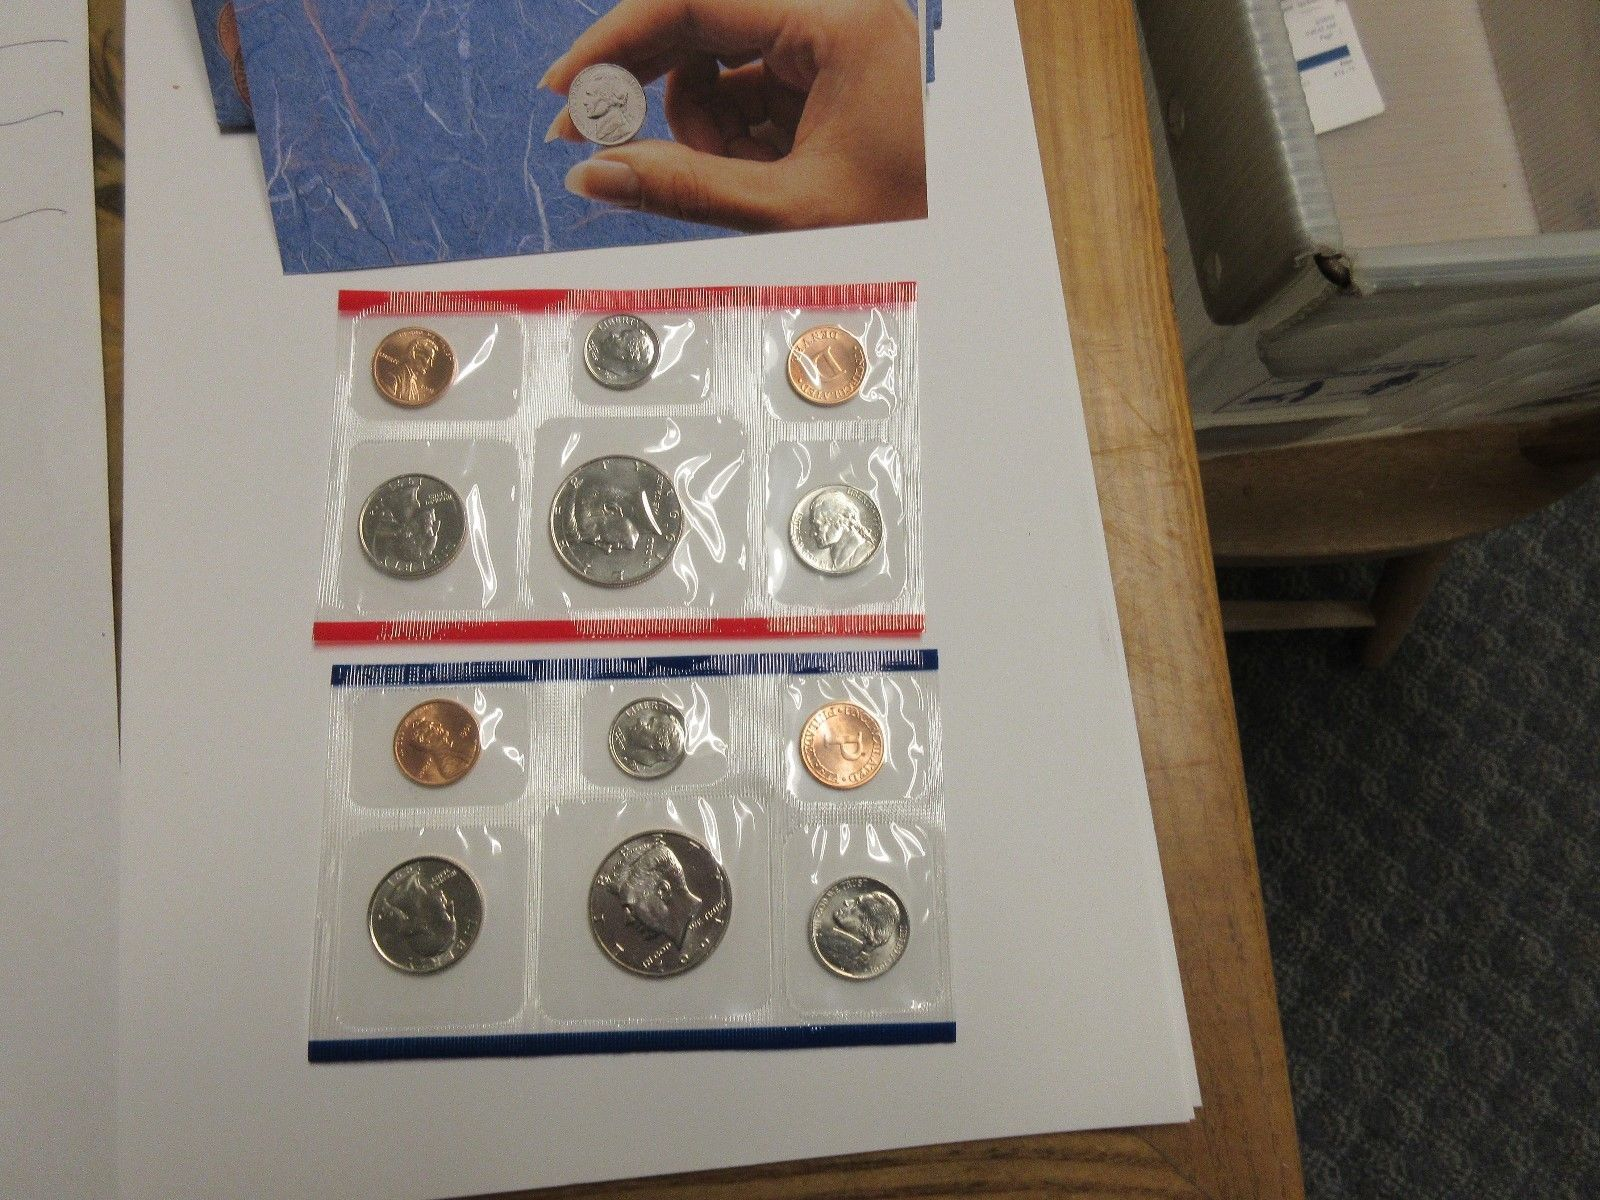 1991 , United States Mint , Uncirculated Mint Set , Lot of 5 Sets image 7